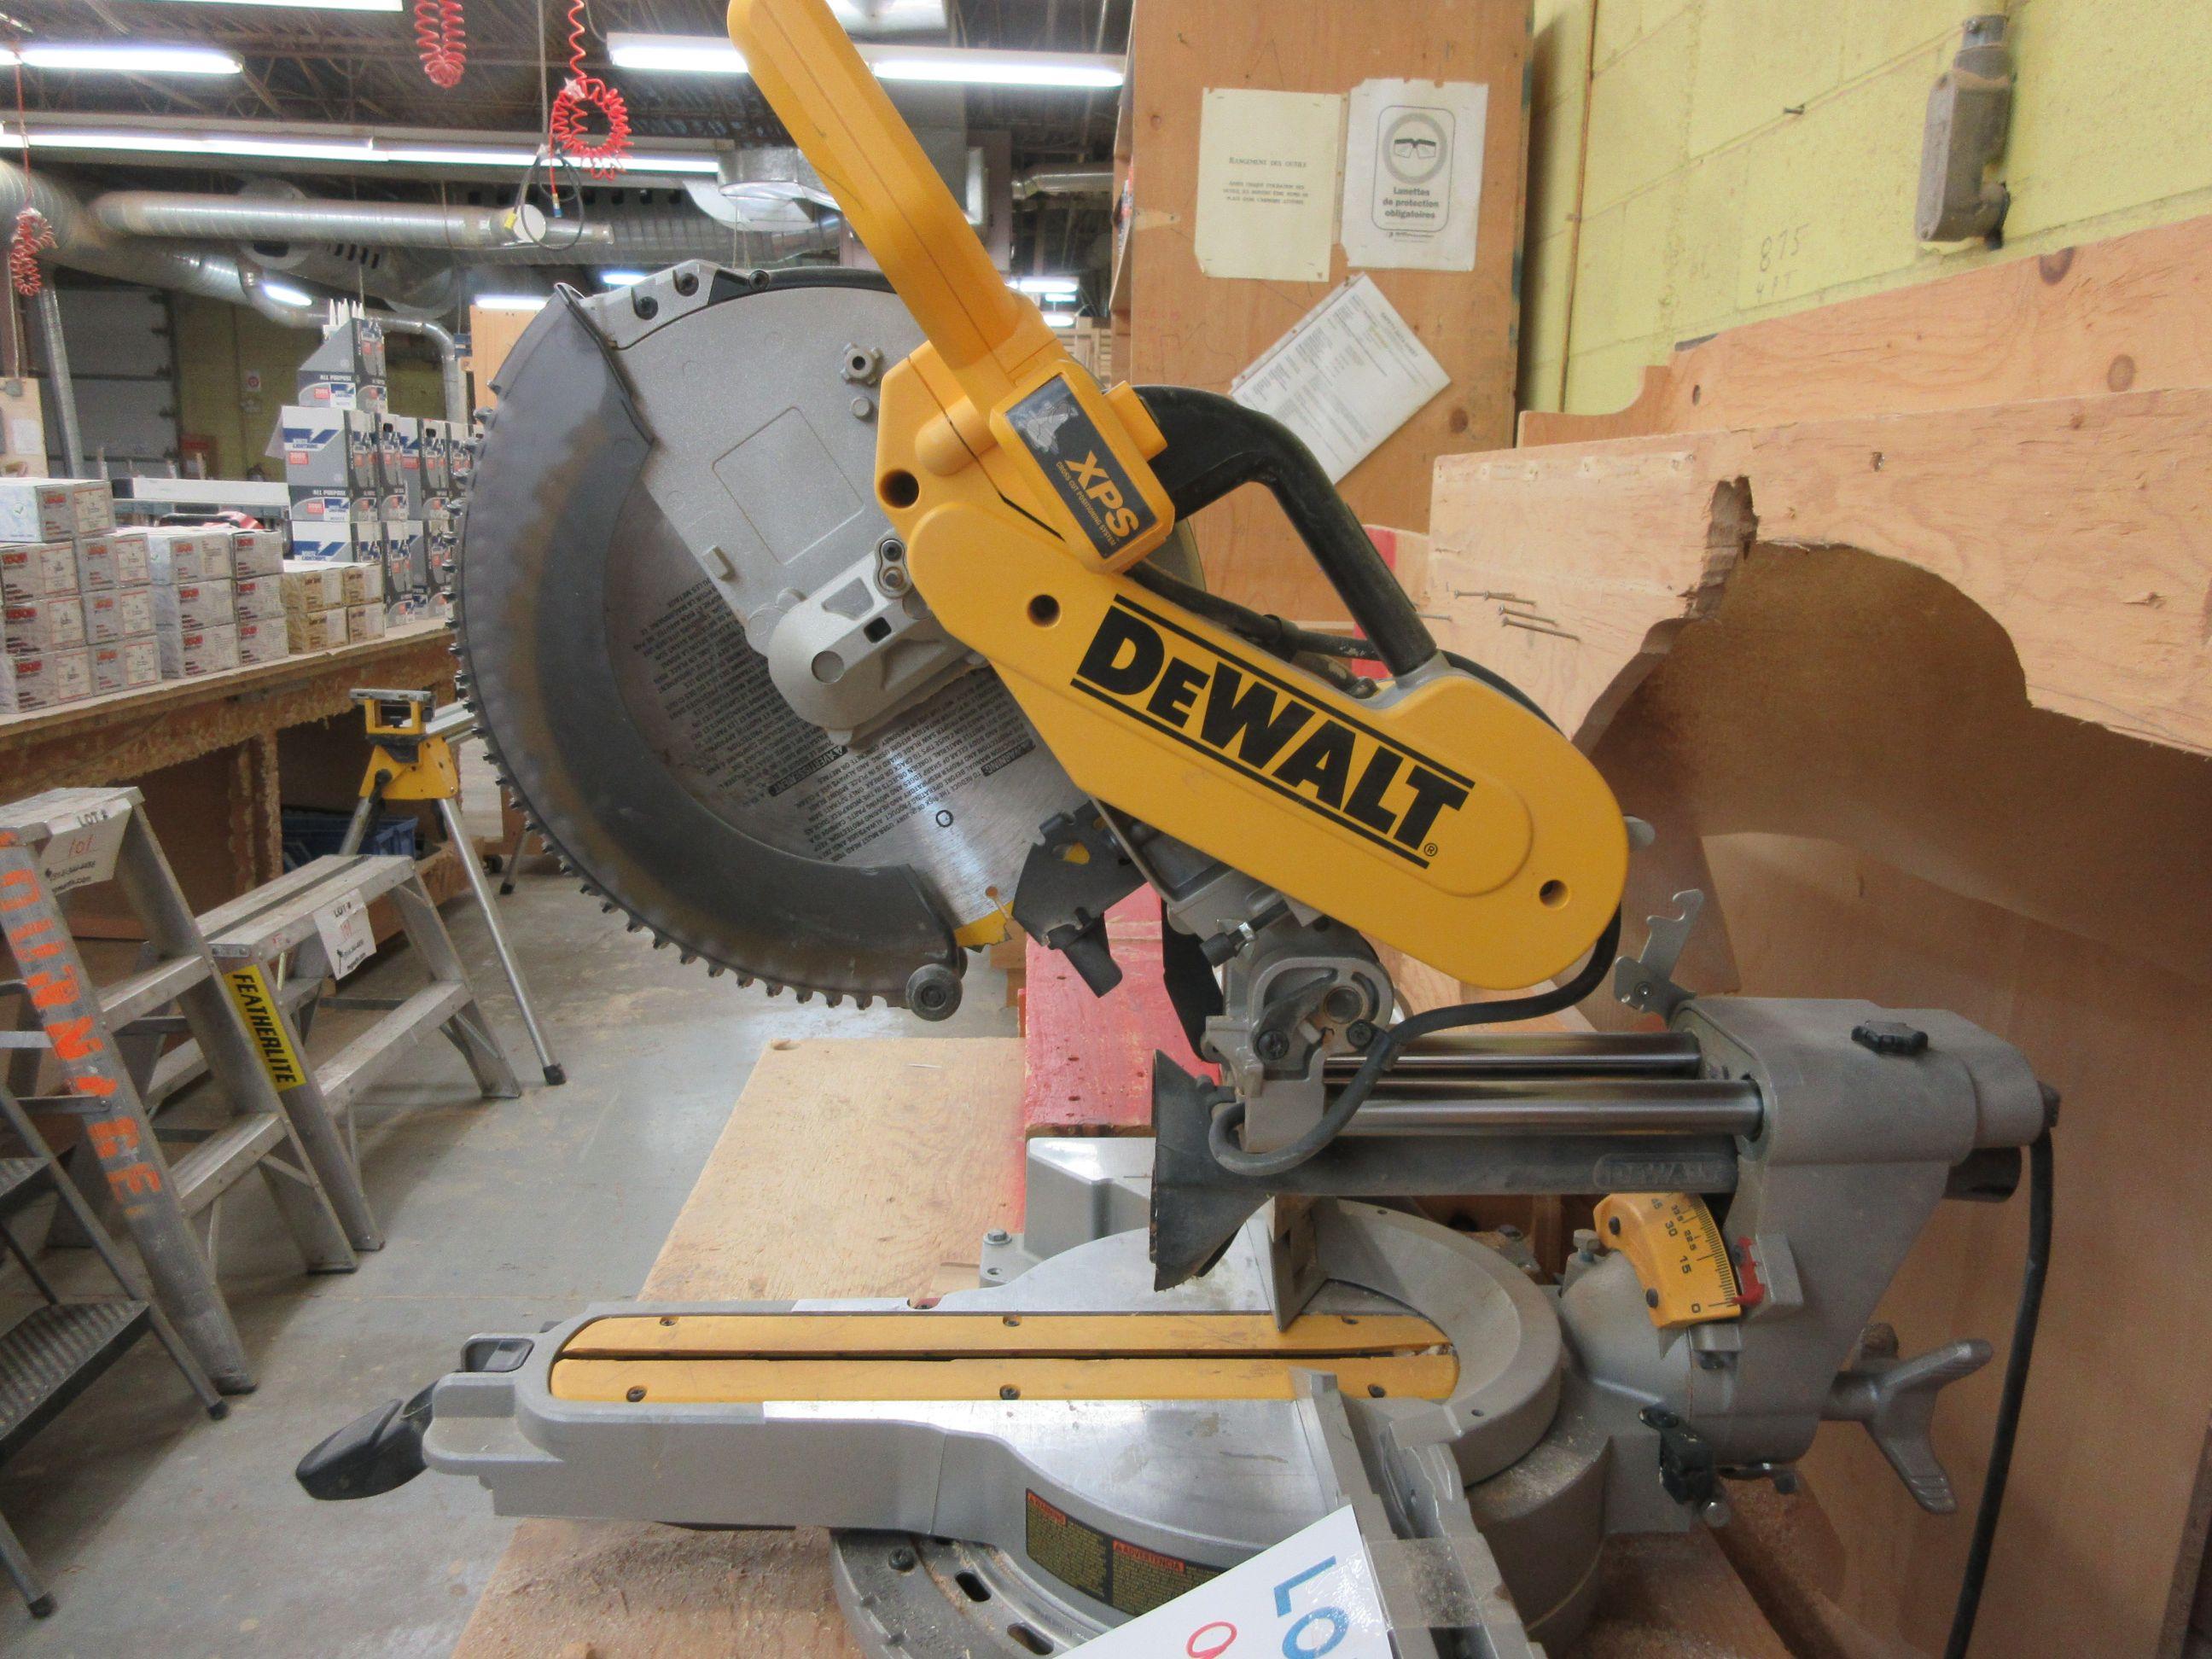 DEWALT miter saw Mod: DWS 780, c/w work cabinet